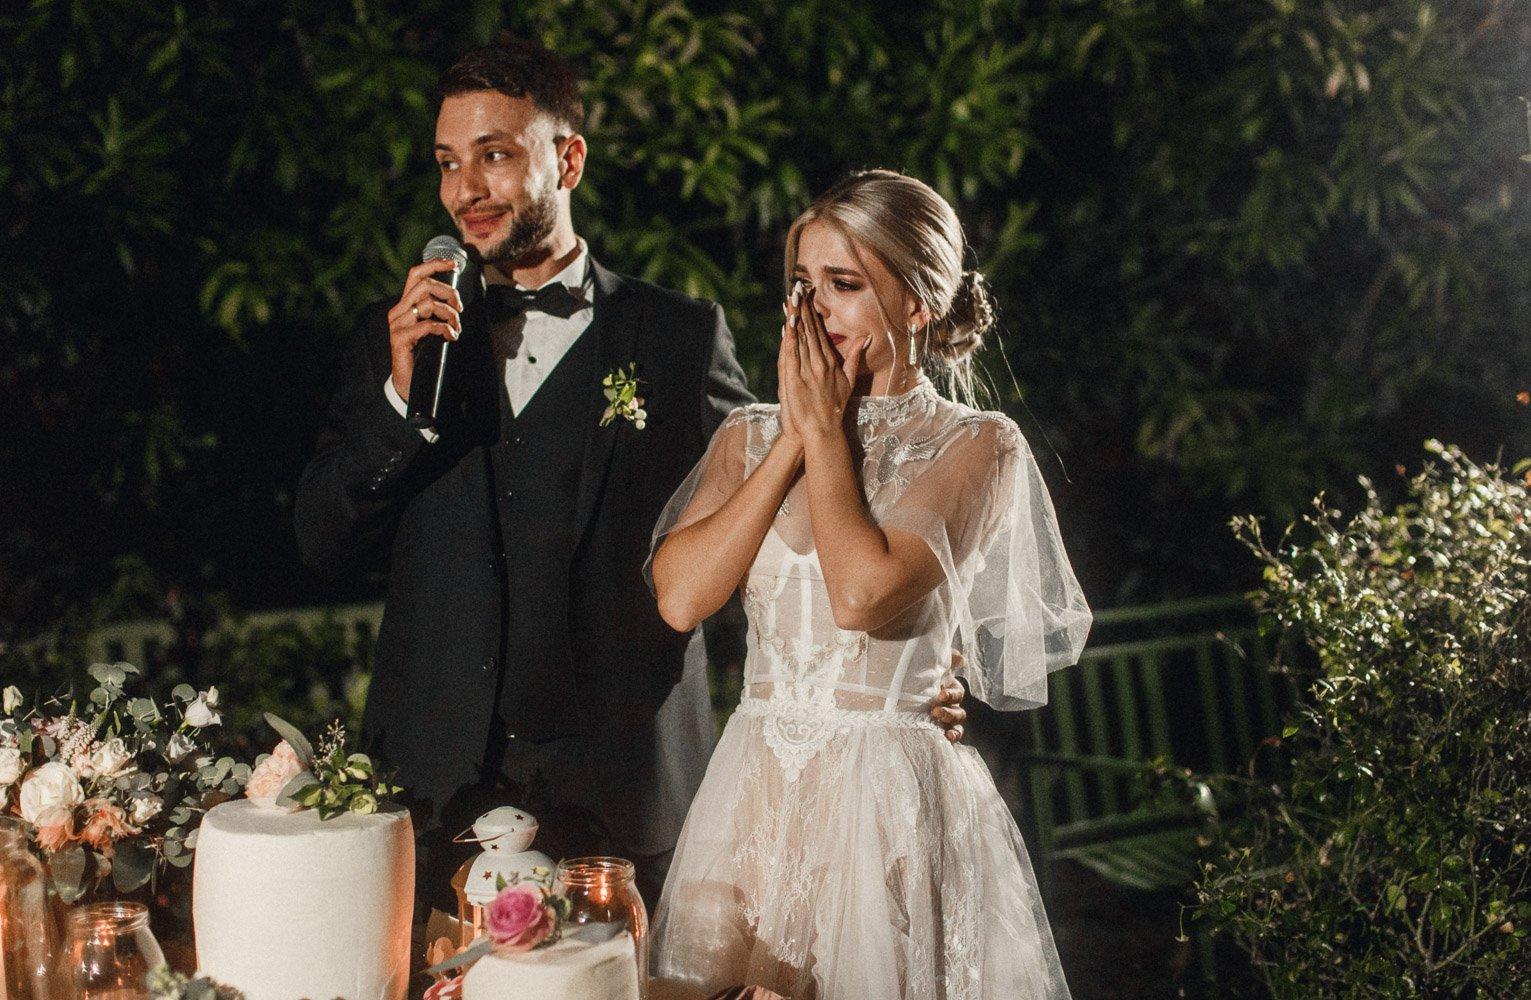 Hochzeitsfotograf Italien, freie Trauung am Comer See, Hochzeit Lago di Como